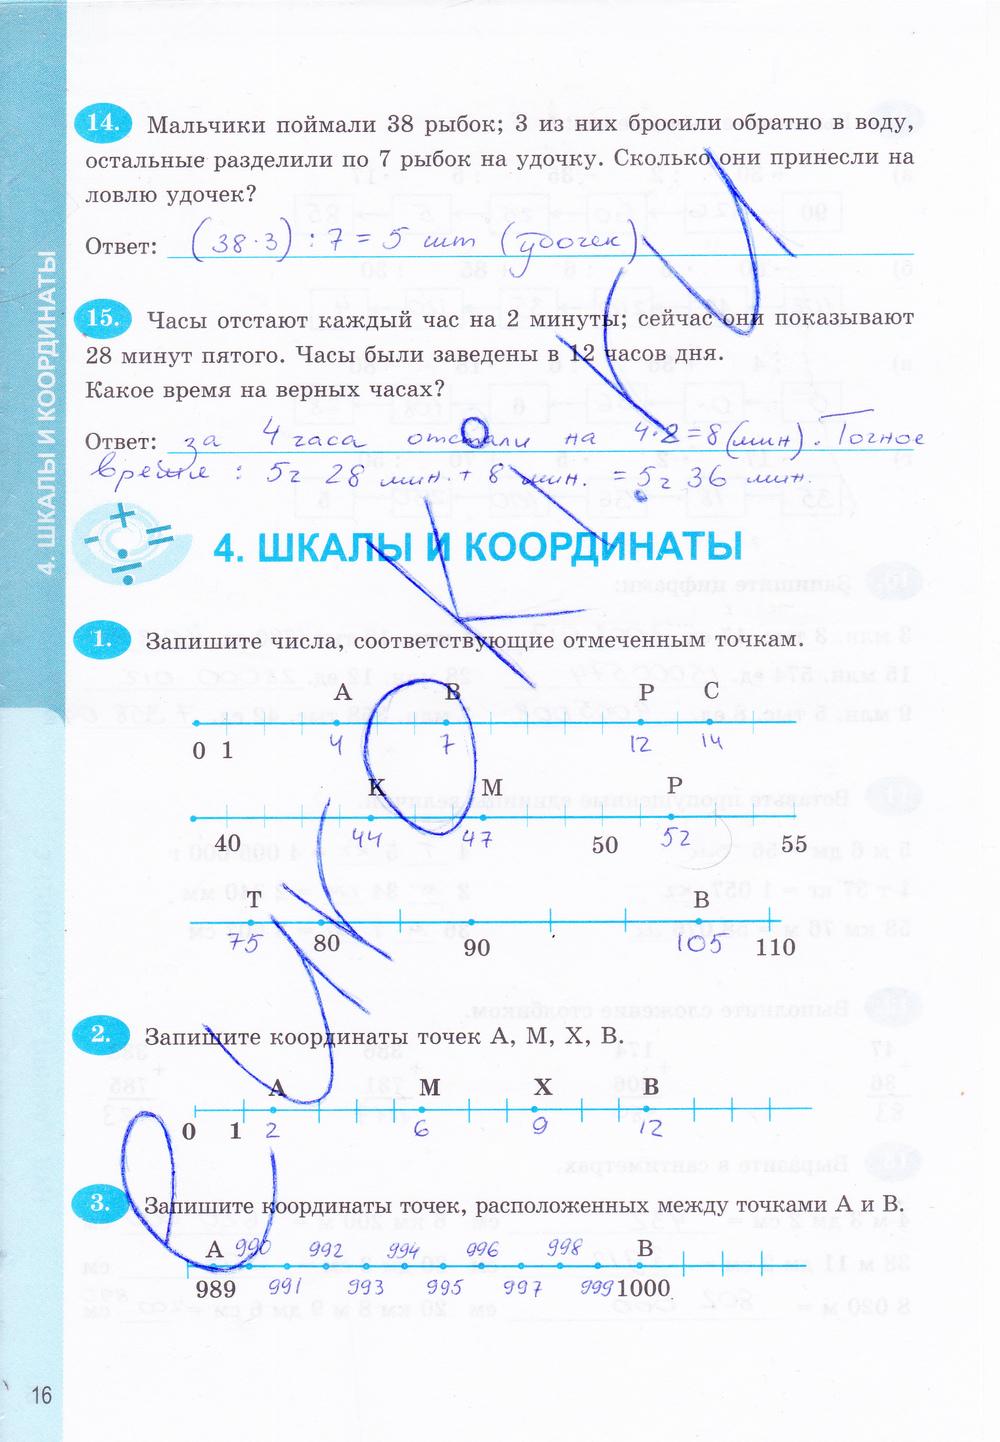 Гдз задачи по математики 6 класс рабочая тетрадь автор т.м.ерина